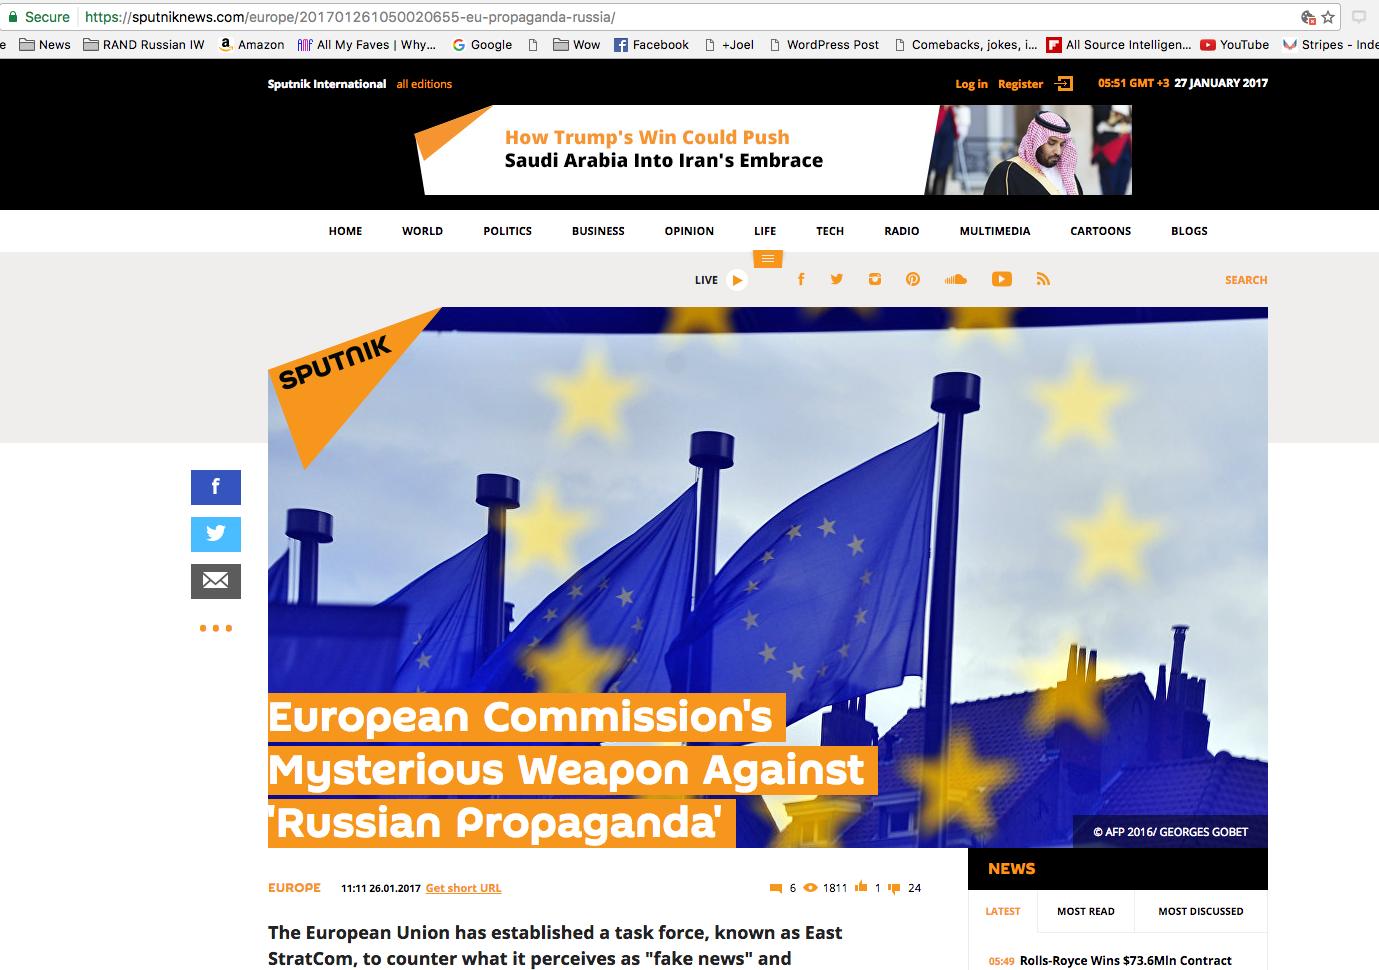 Sputnik Attempts To Belittle The EU East Stratcom Task Force